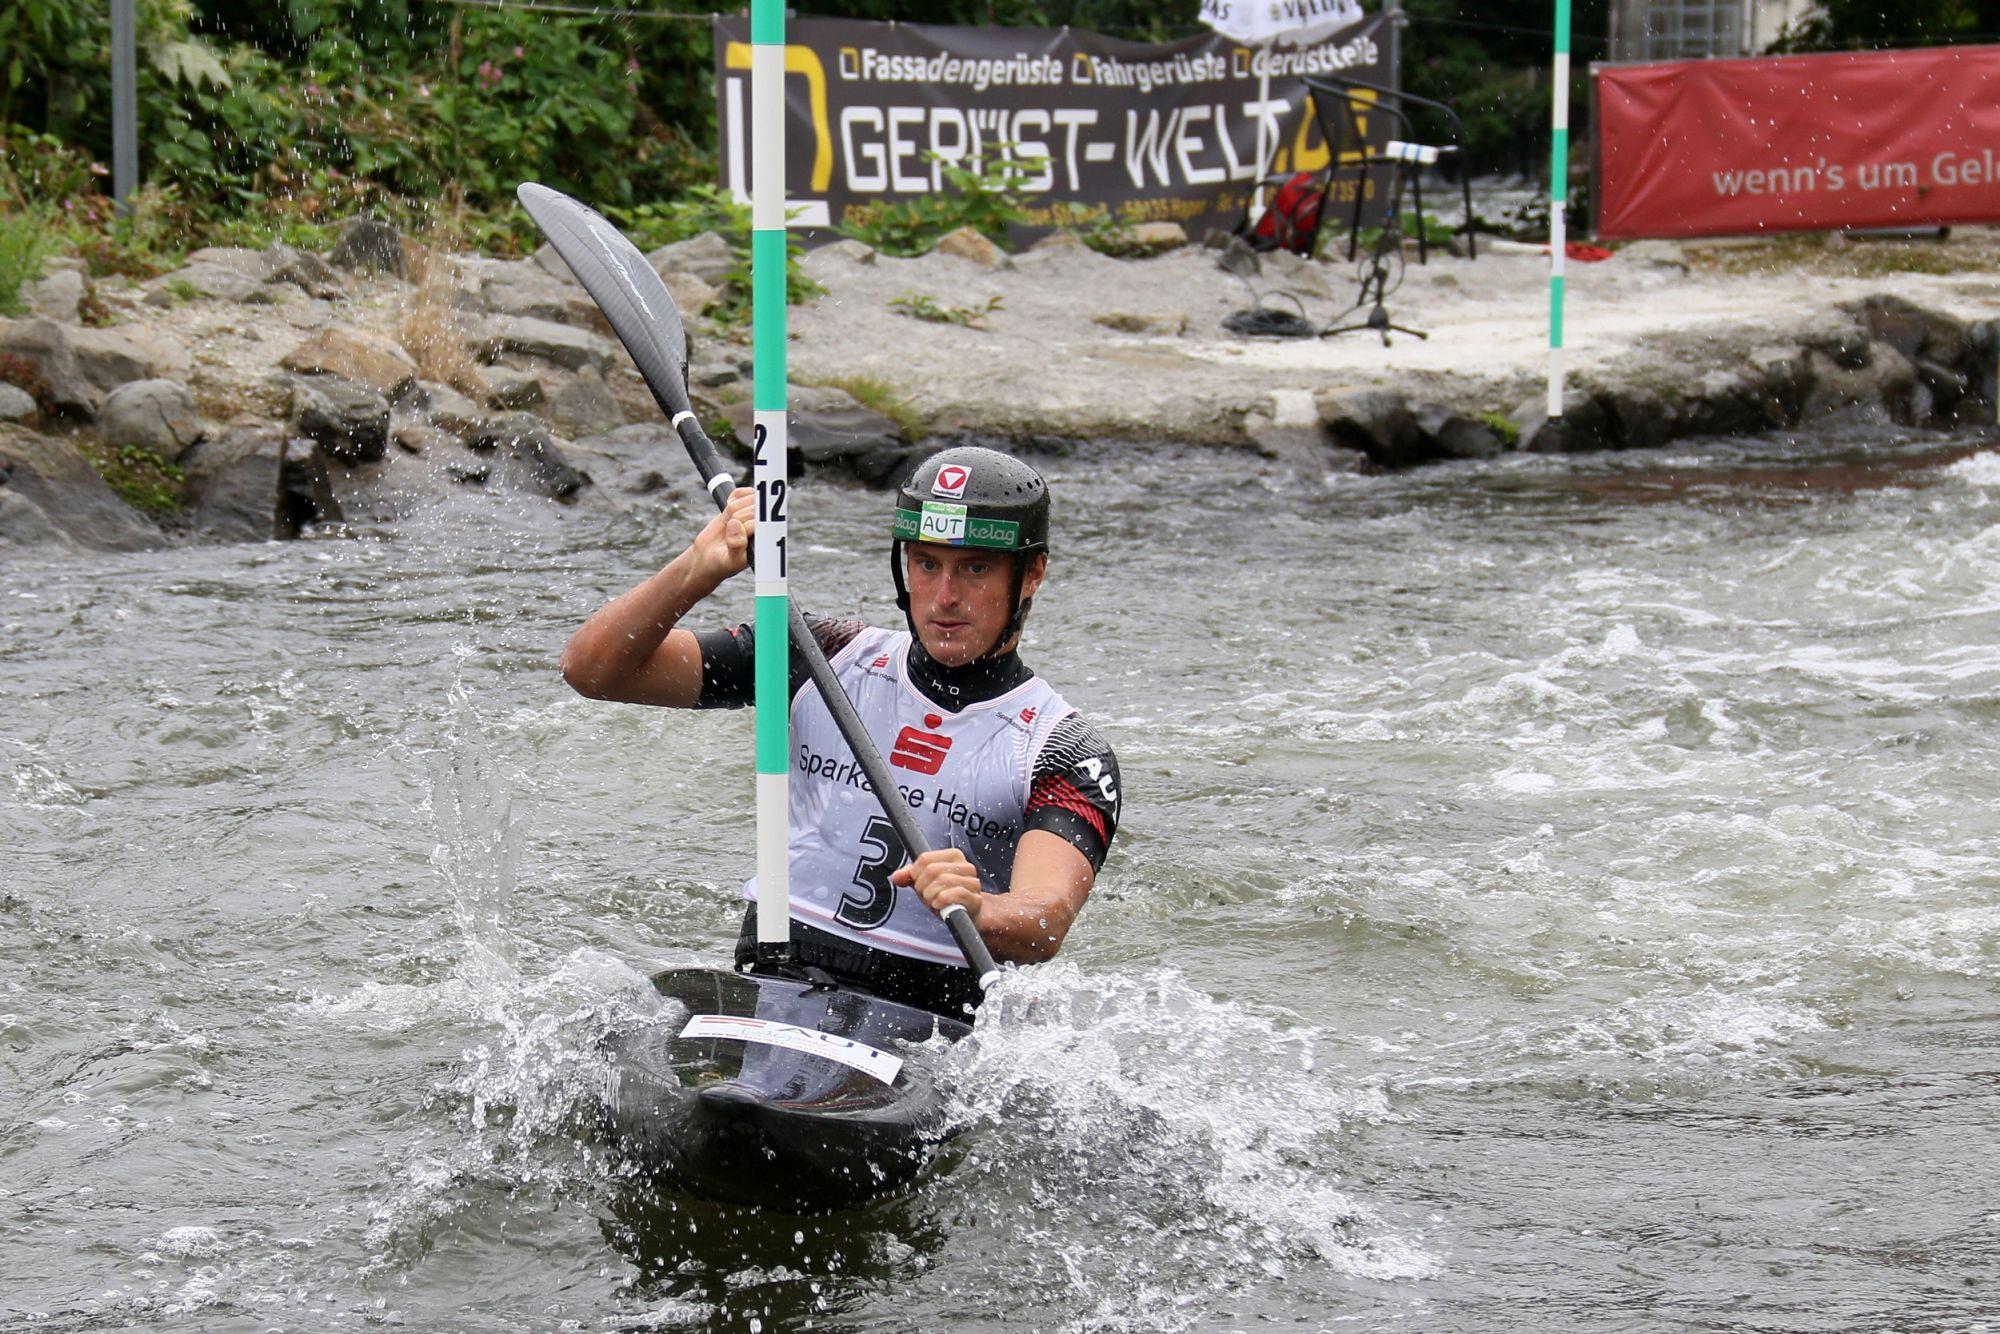 2019 European Junior and U23 Canoe Slalom Championships